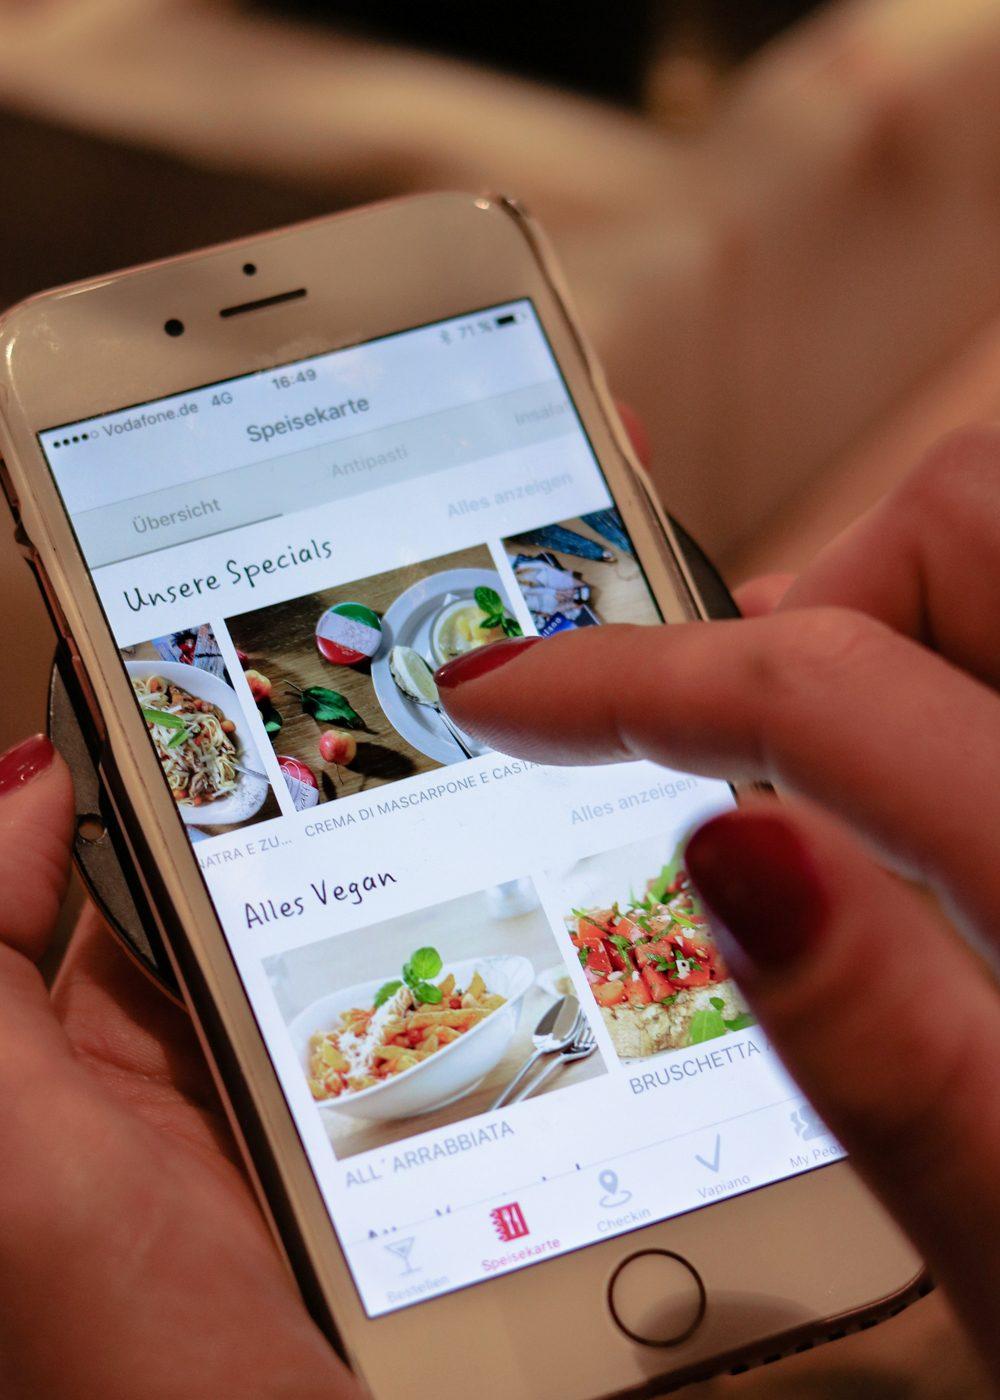 Vapiano Mannheim bestellen und bezahlen per App